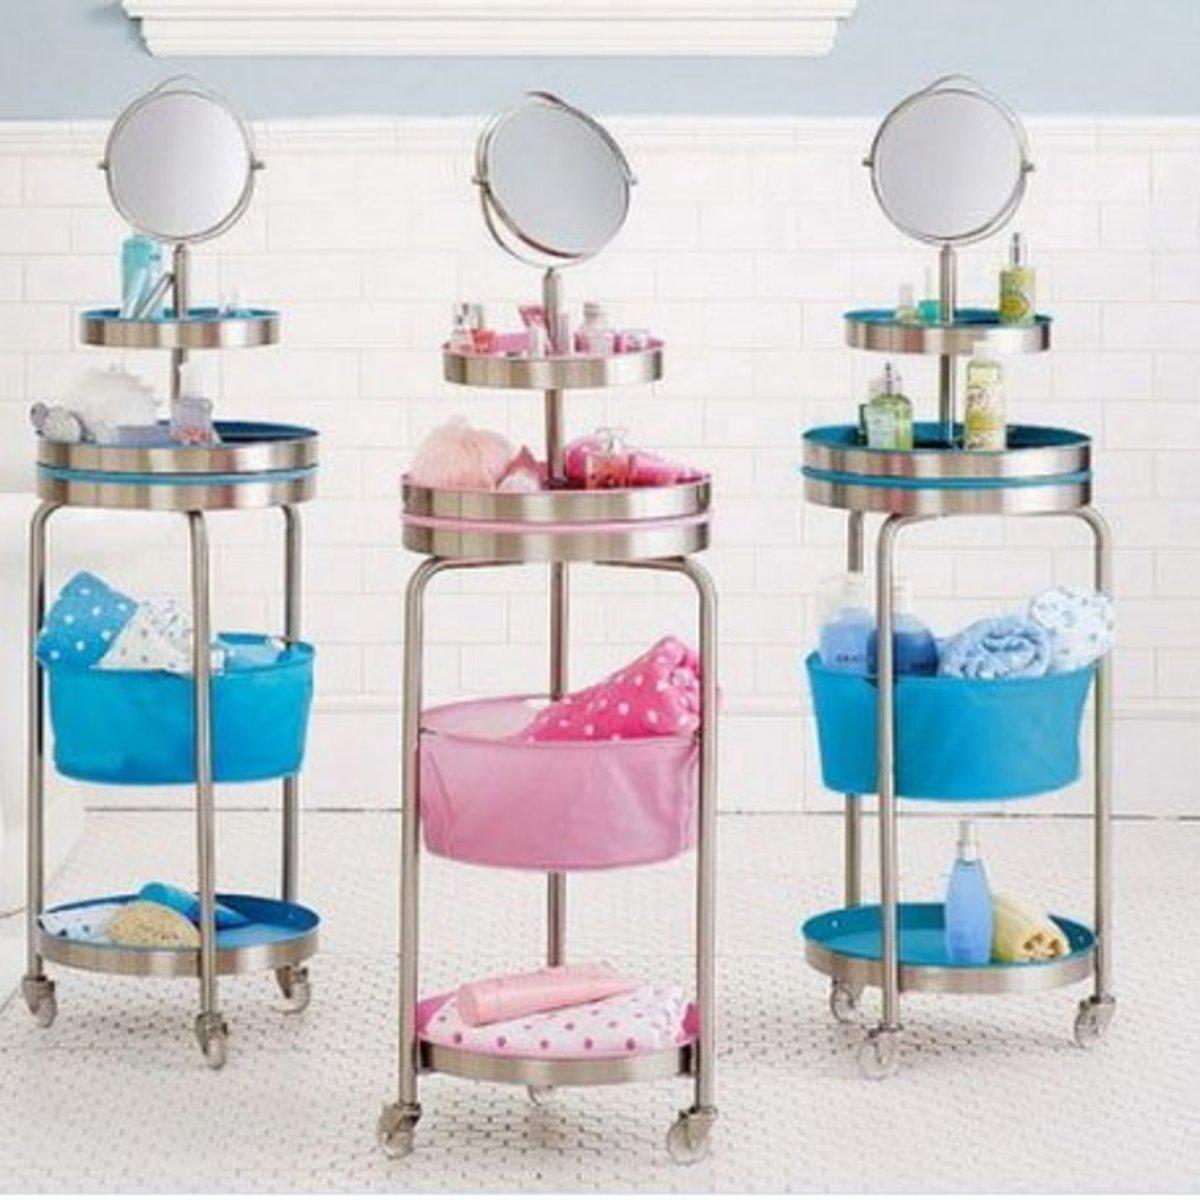 Tiered Trolleys | DIY Makeup Organization Ideas